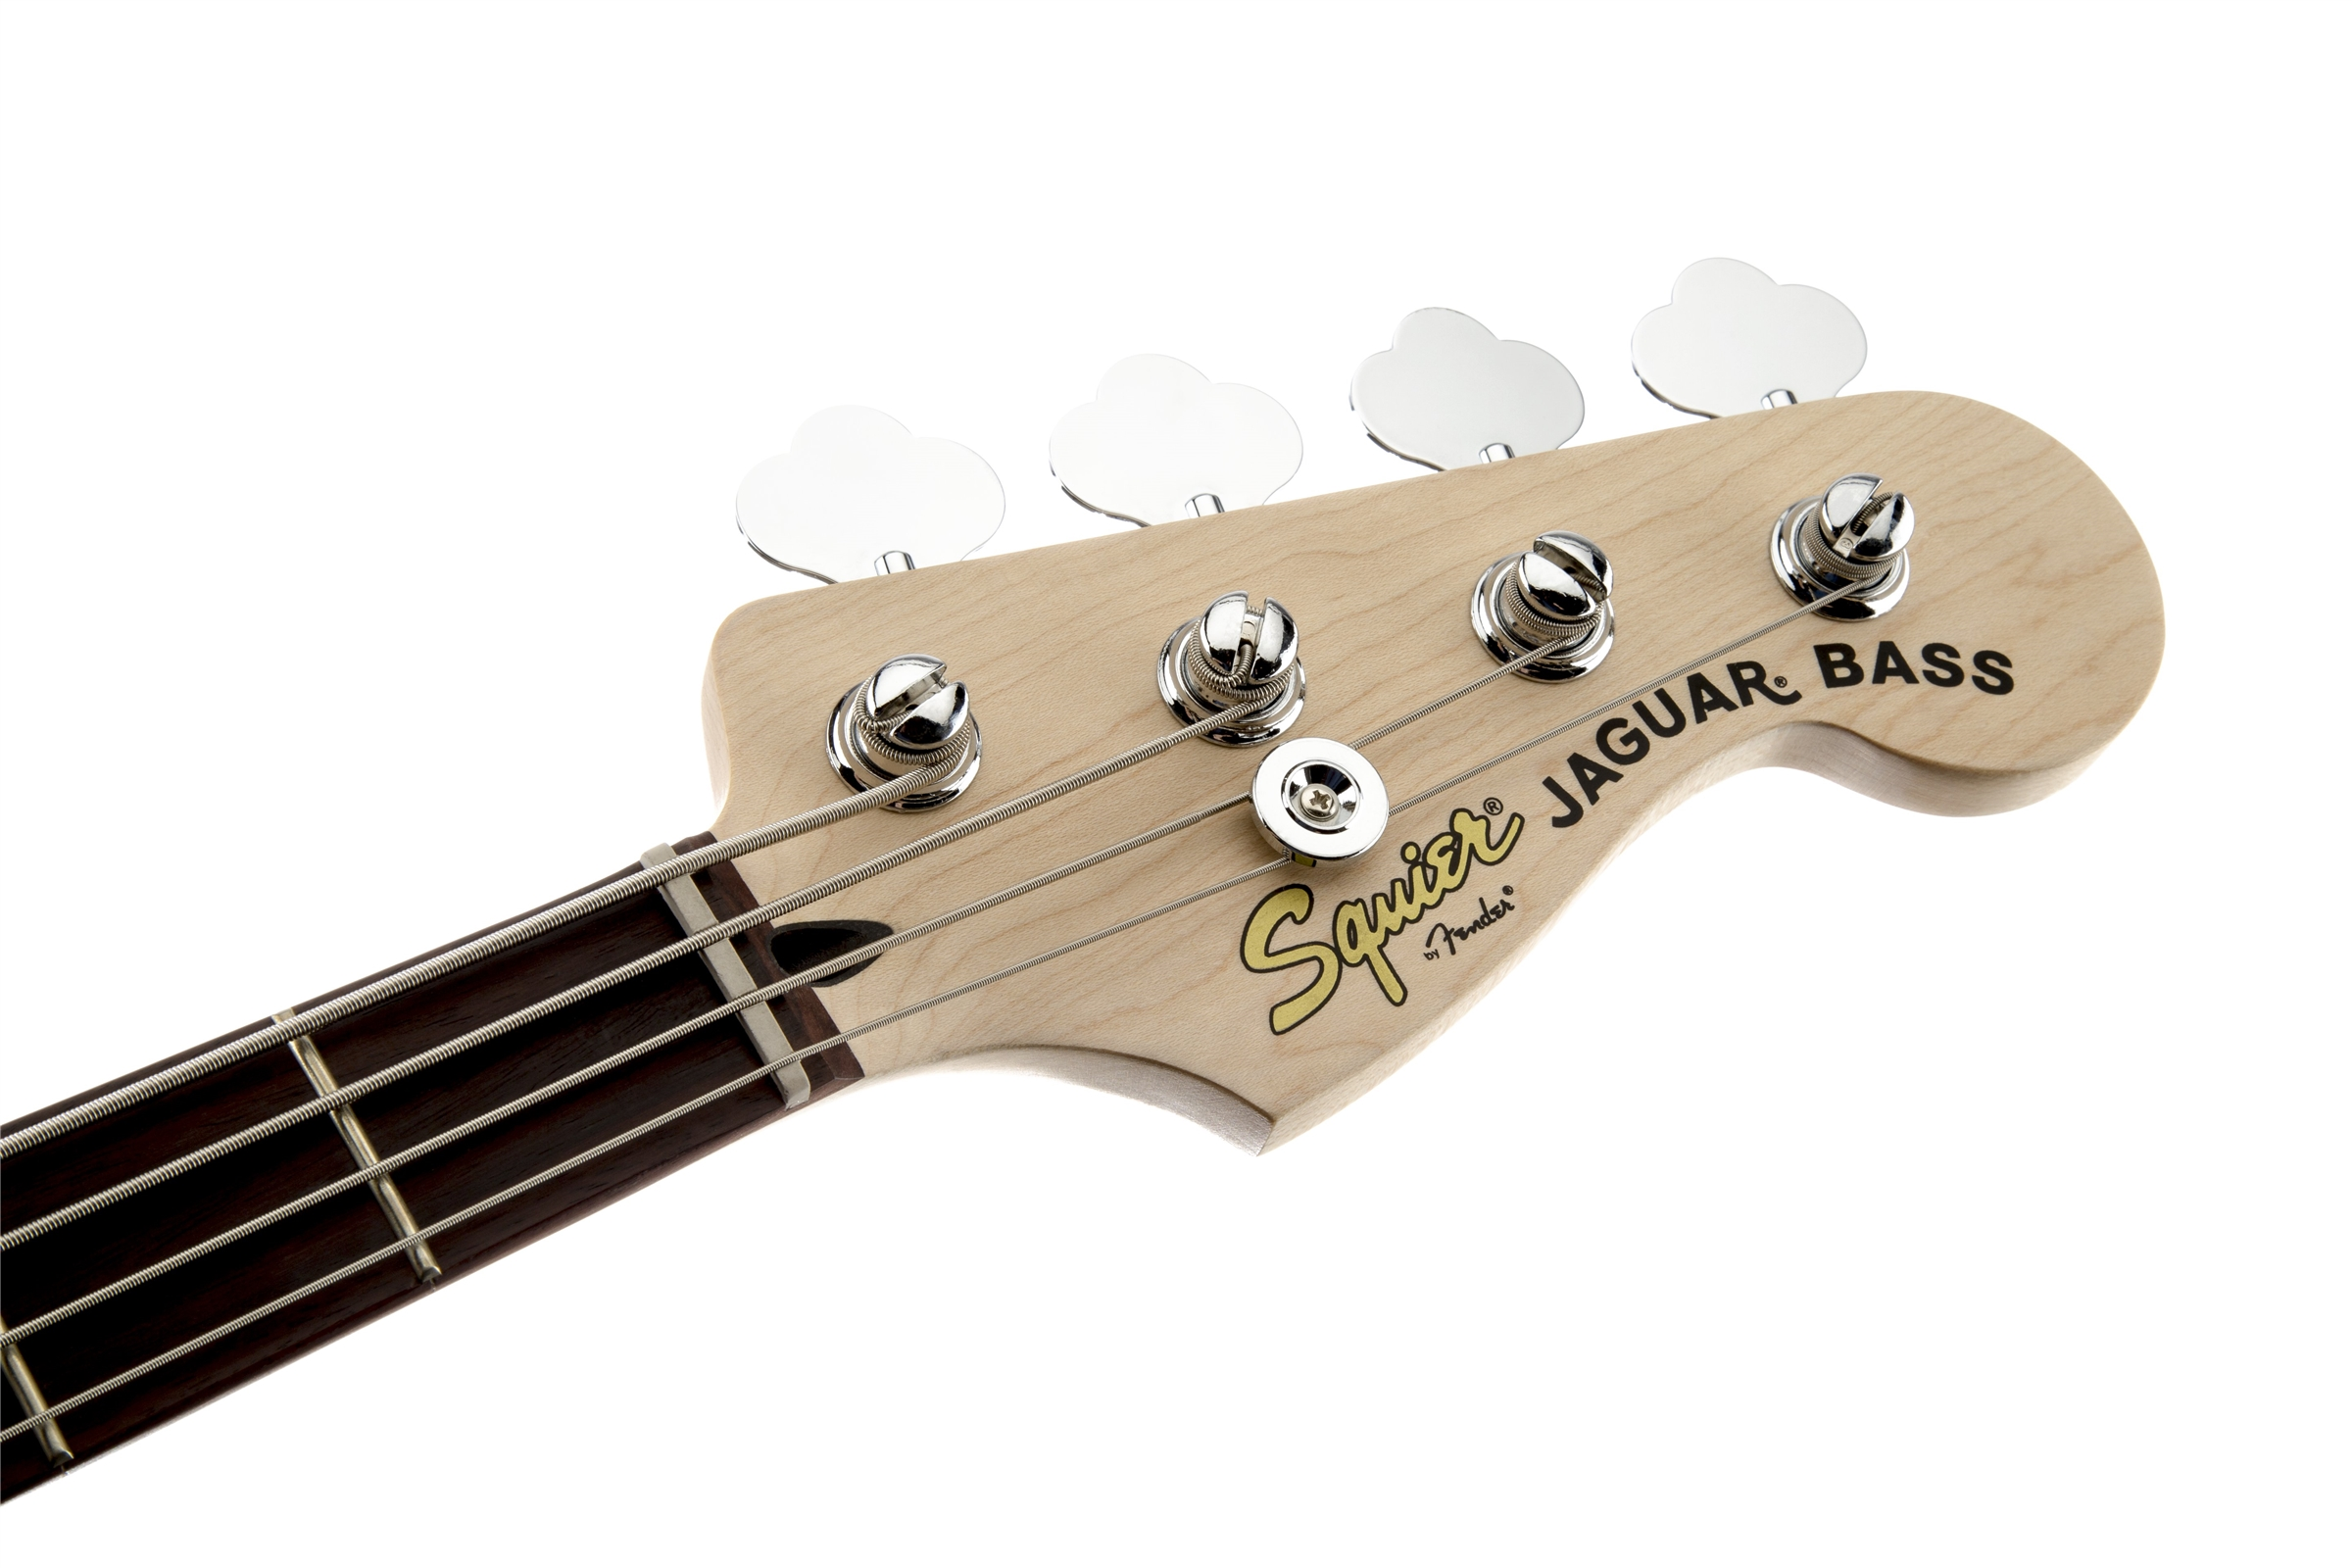 Fender jaguar bass guitar controls | guitar setup youtube.